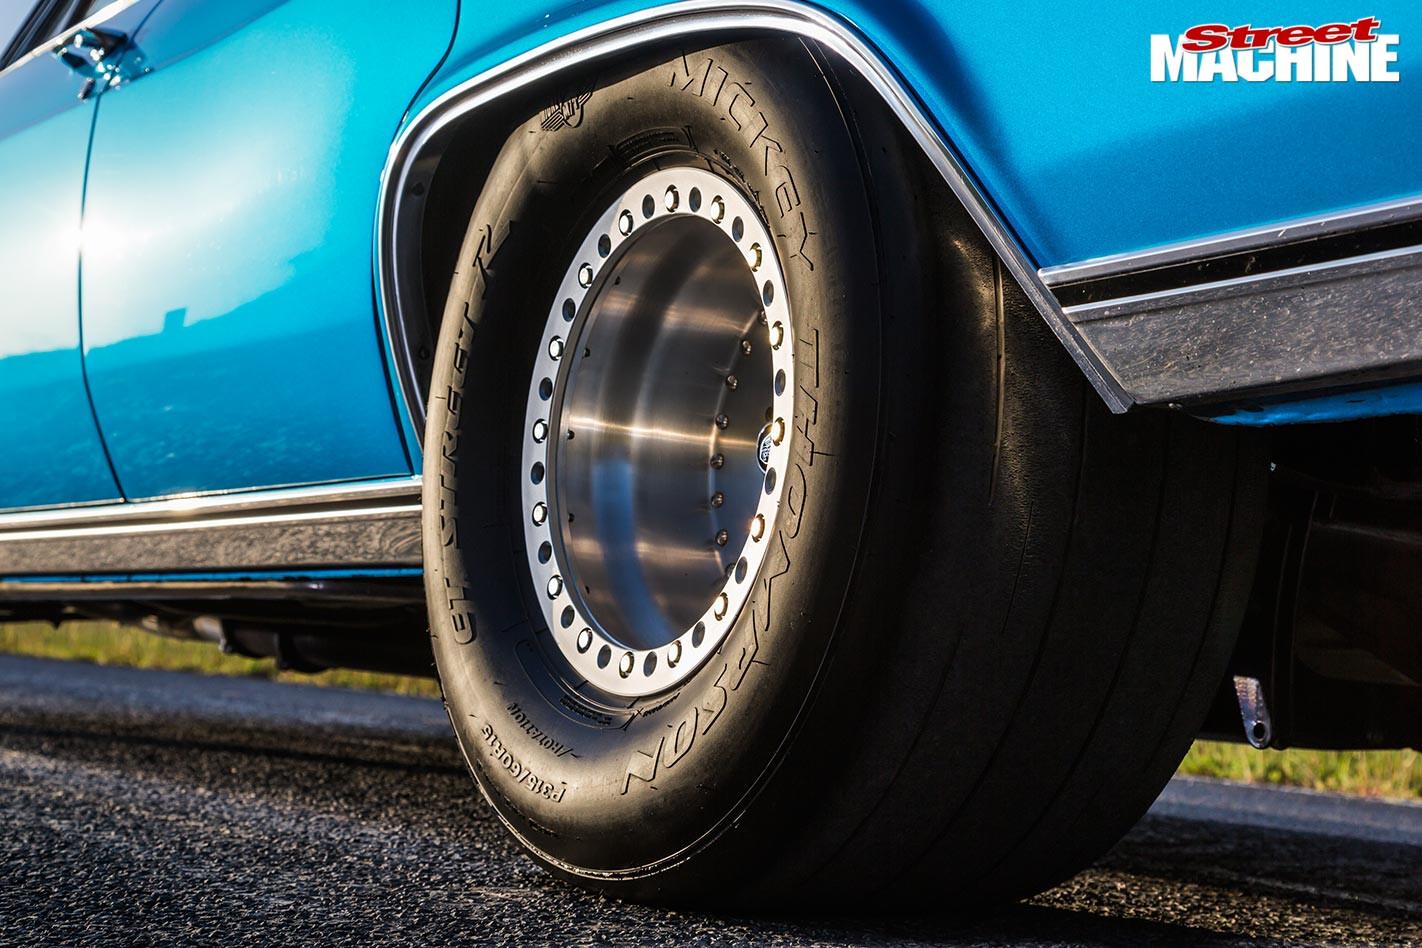 Chev Impala wheel